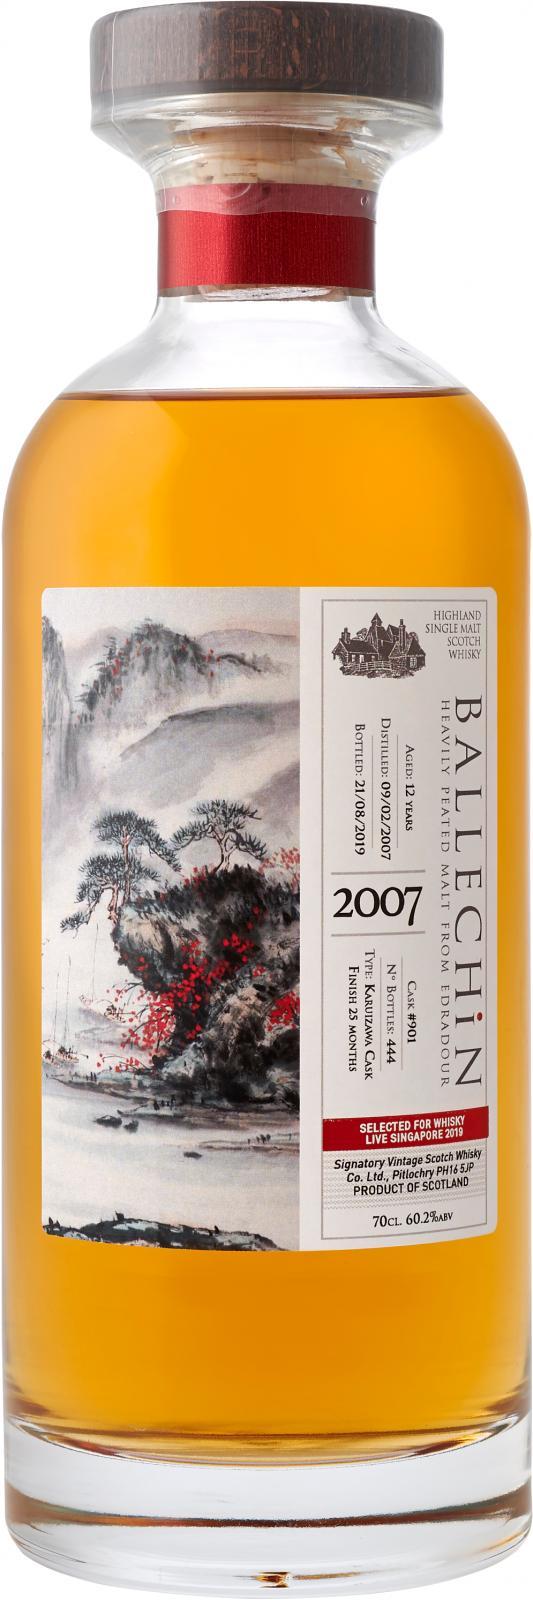 Ballechin 2007 SV